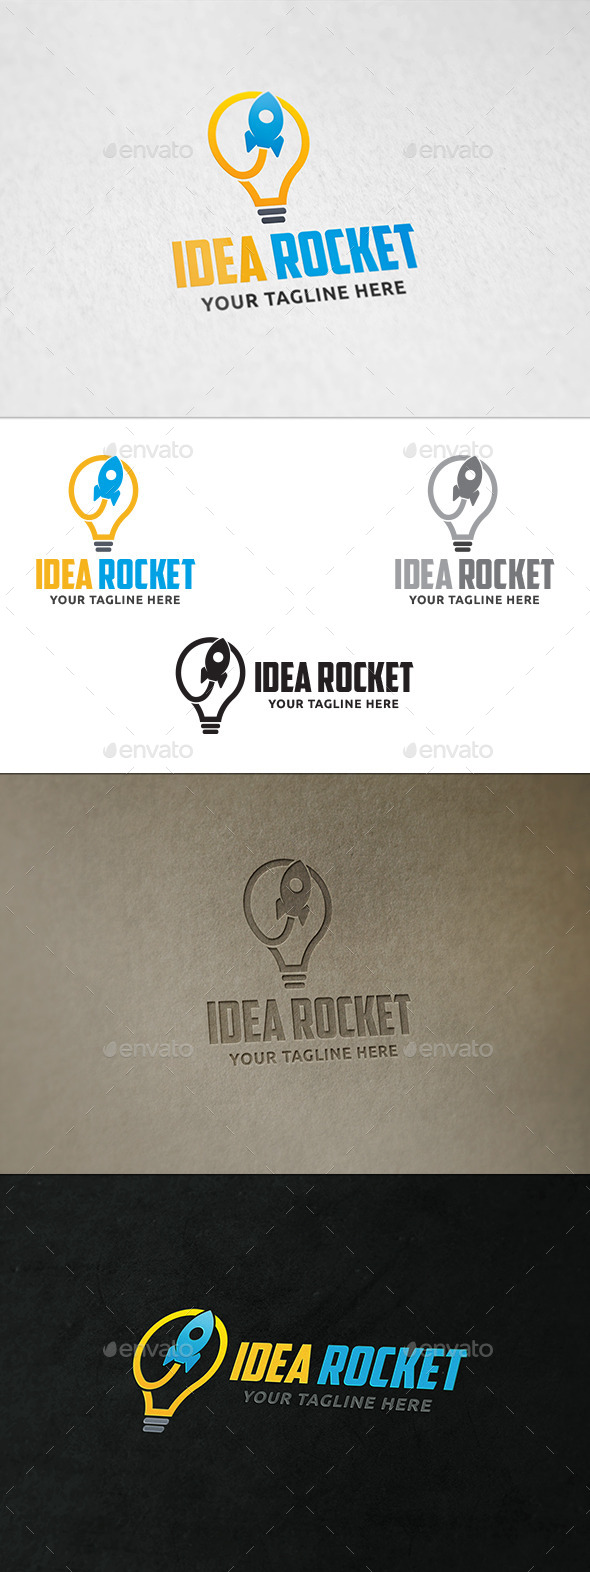 Idea Rocket - Logo Template